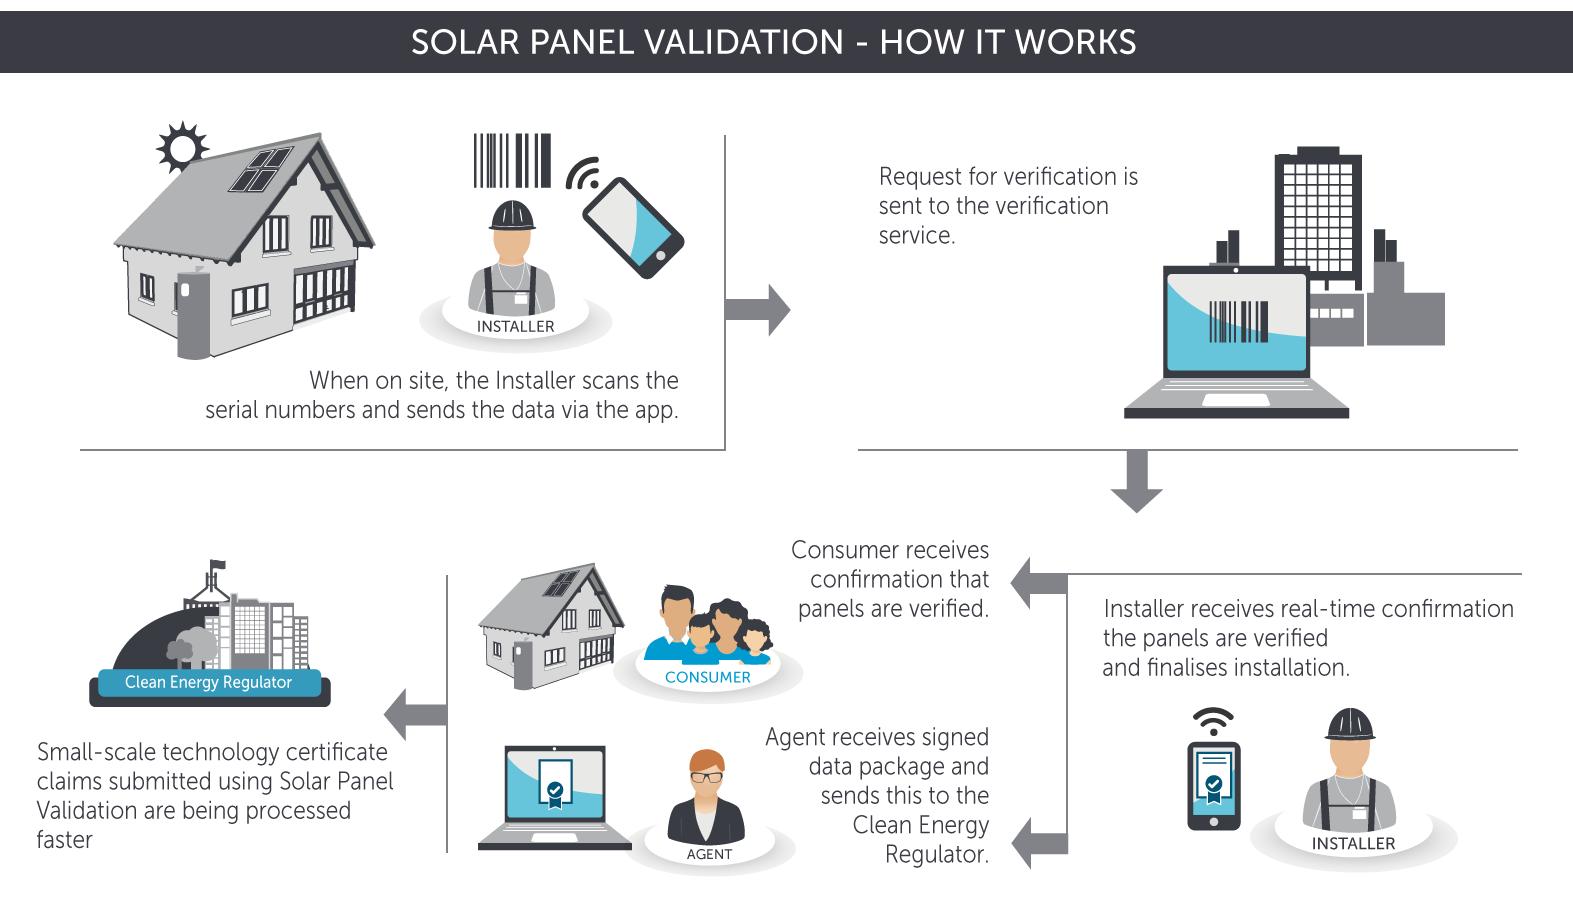 http://www.cleanenergyregulator.gov.au/PublishingImages/SolarPanelValidation.png